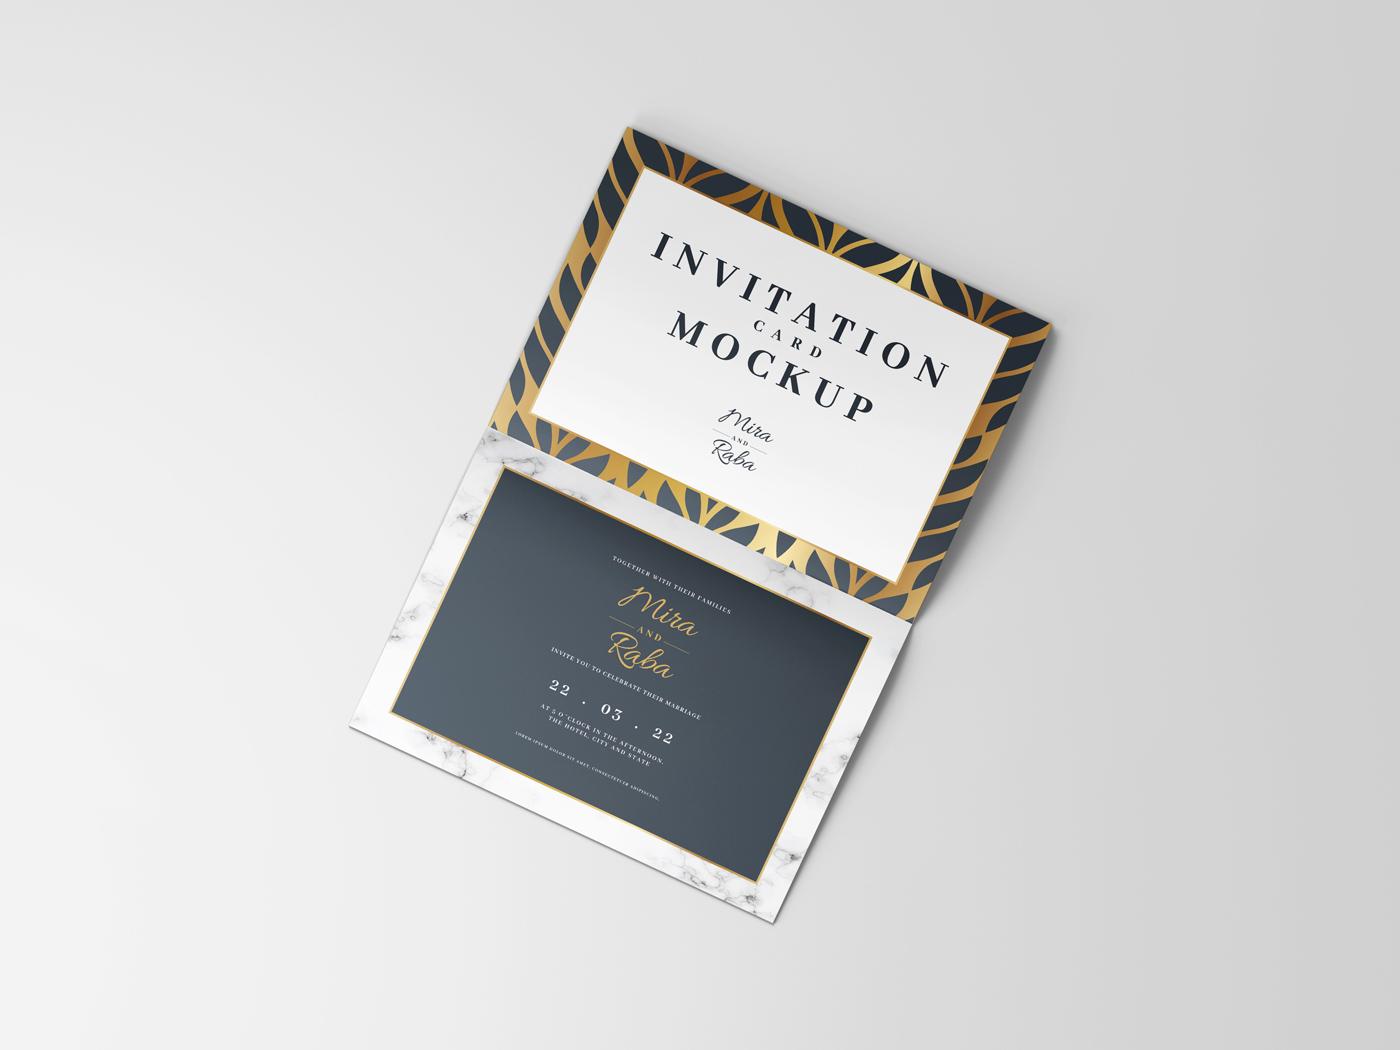 Invitation Card Mockups V1 example image 10